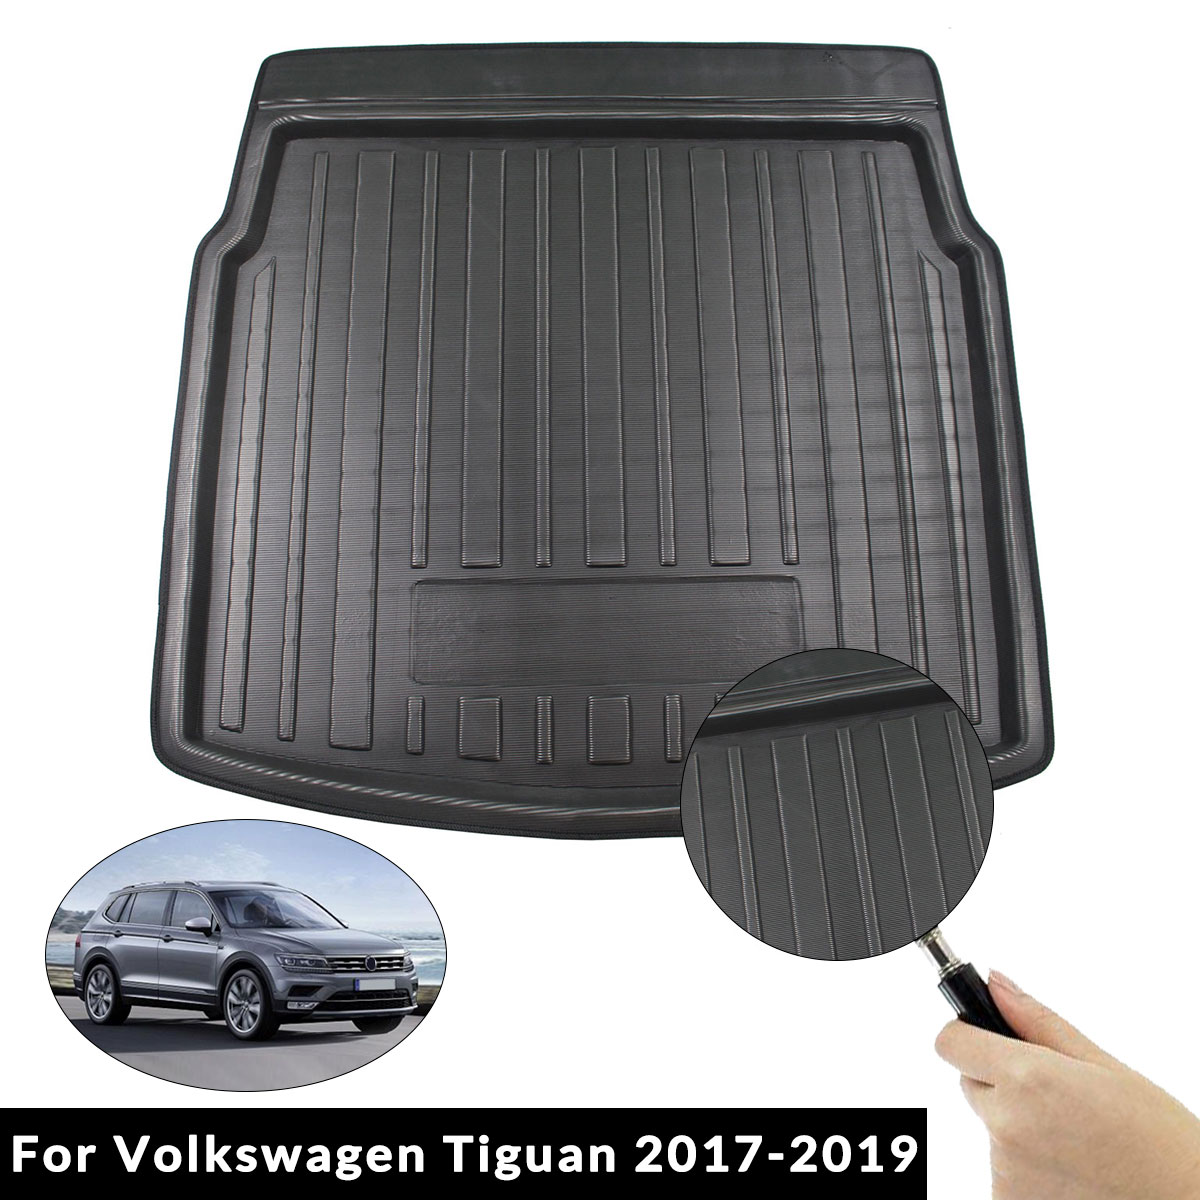 Car Interior Cargo Liner Boot Tray Rear Trunk Cover Matt Mat Floor Carpet Kick Pad For Volkswagen For VW Tiguan 2017 2018 2019